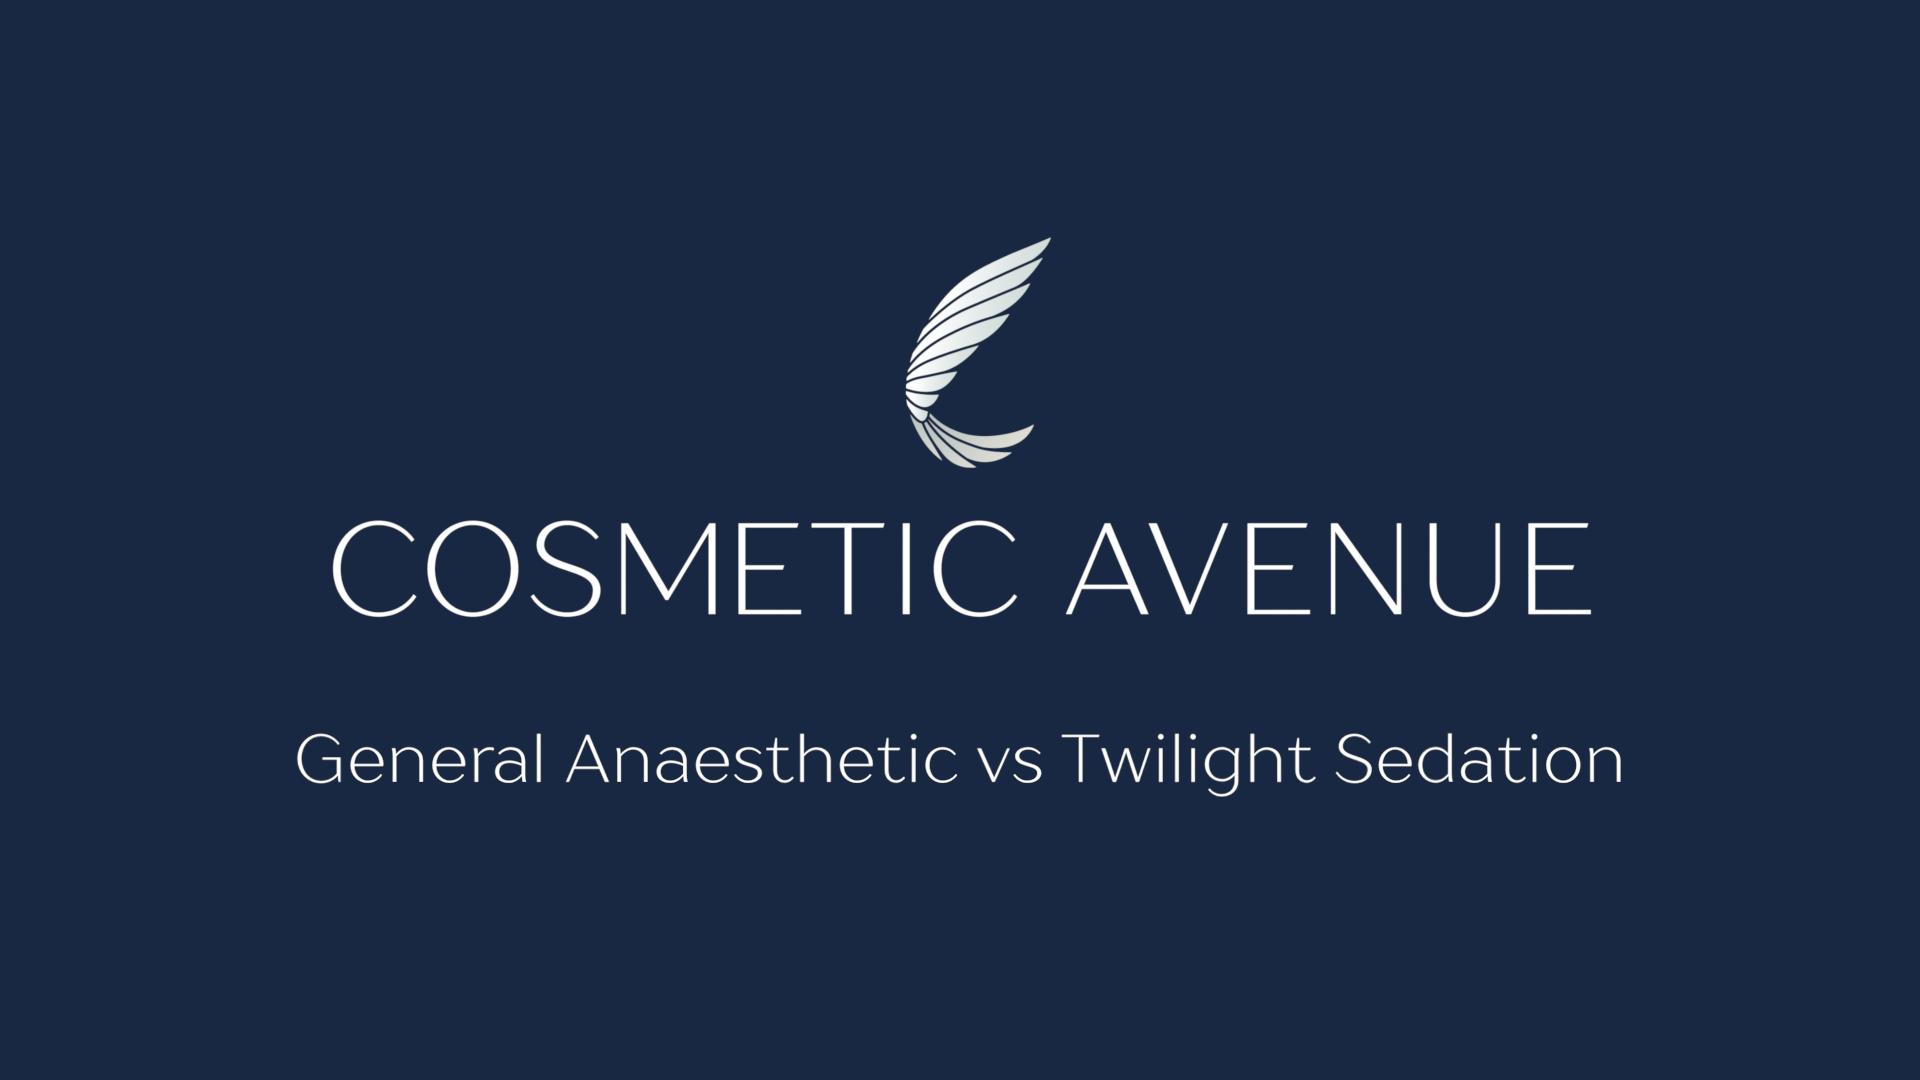 General-Anaesthetic-vs-Twilight-Sedation